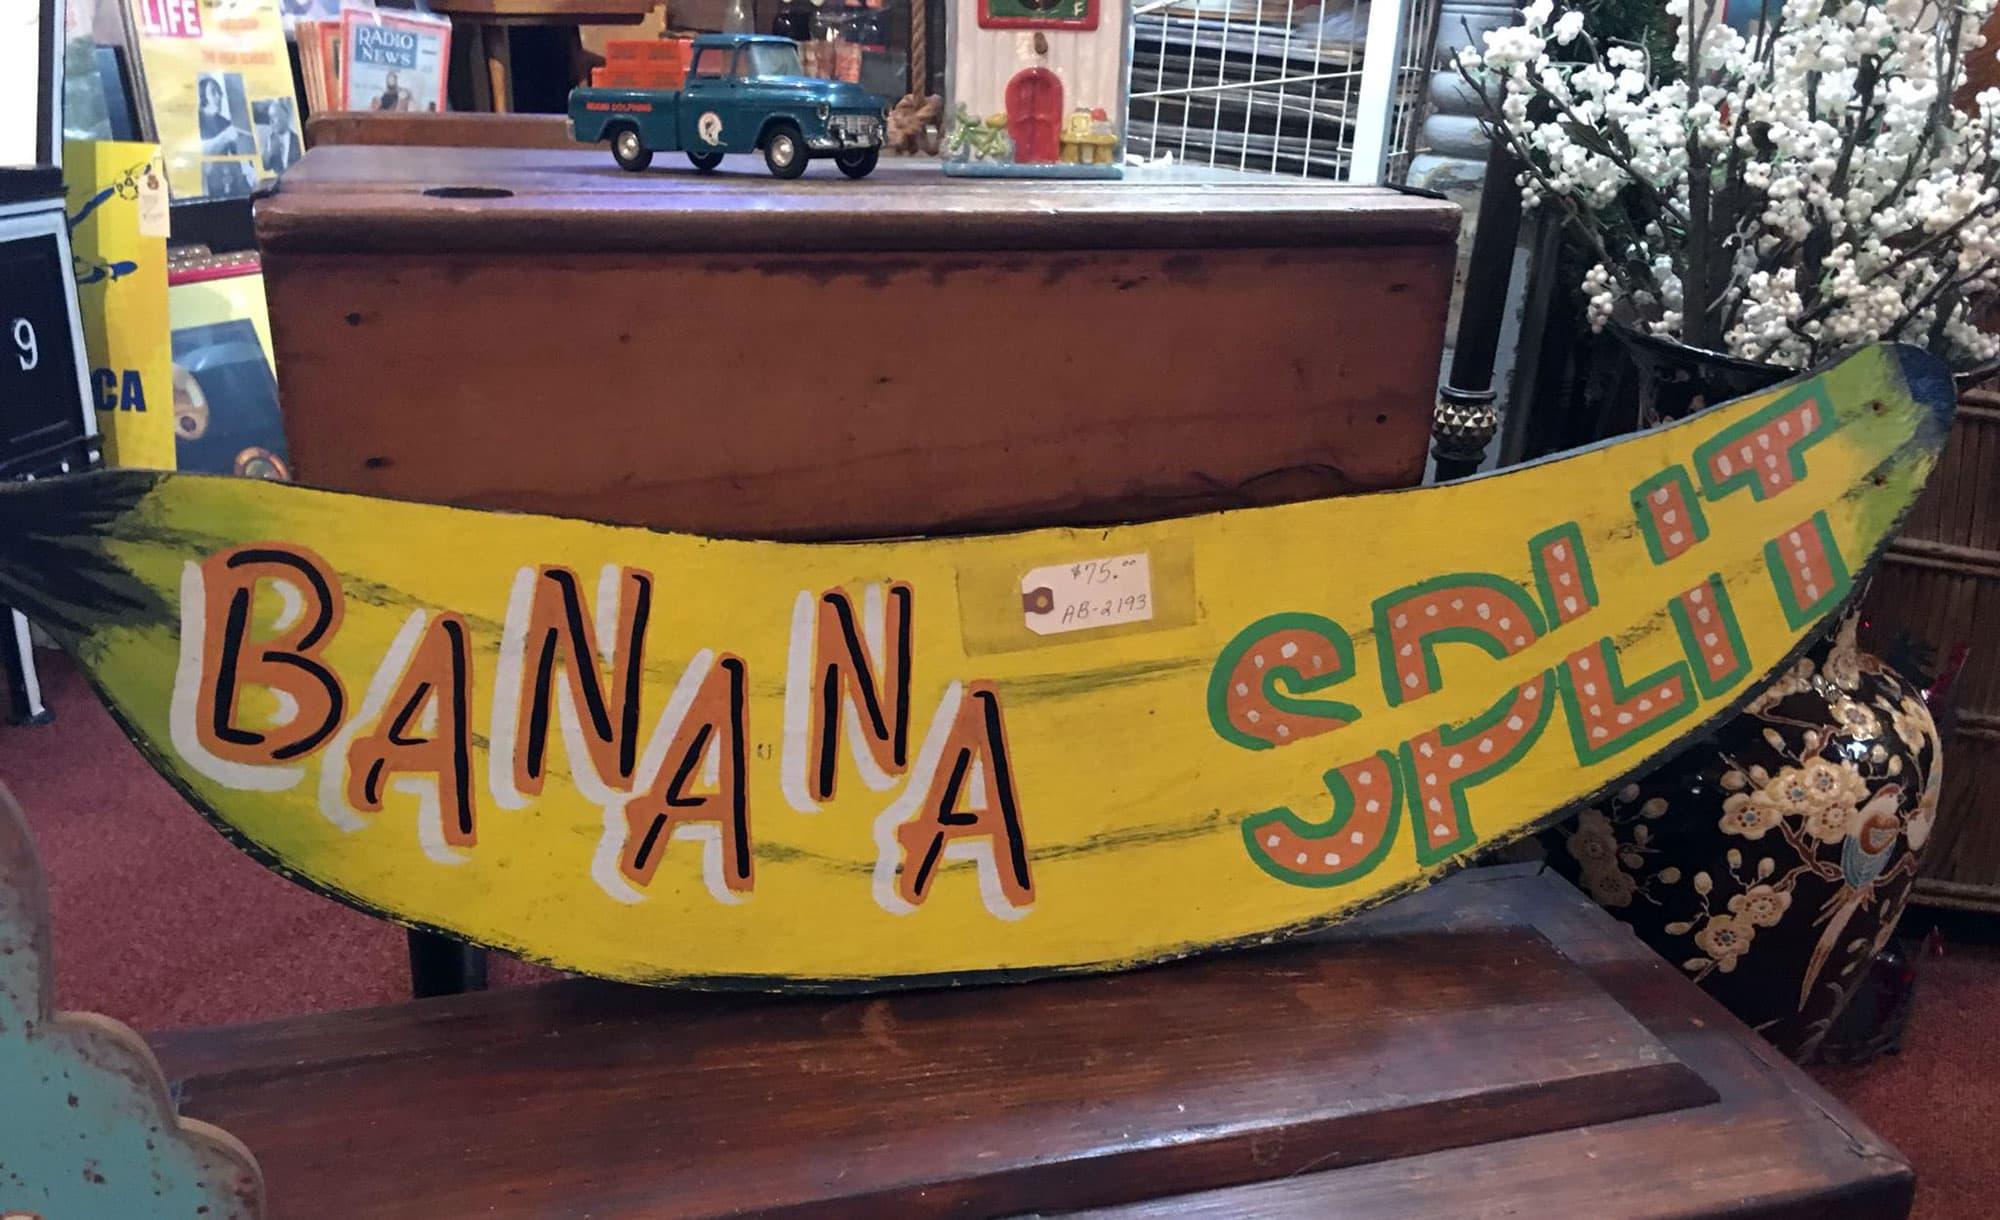 Banana split sign on wooden antique furniture at Biggars Antiques in Lake Alfred, FL